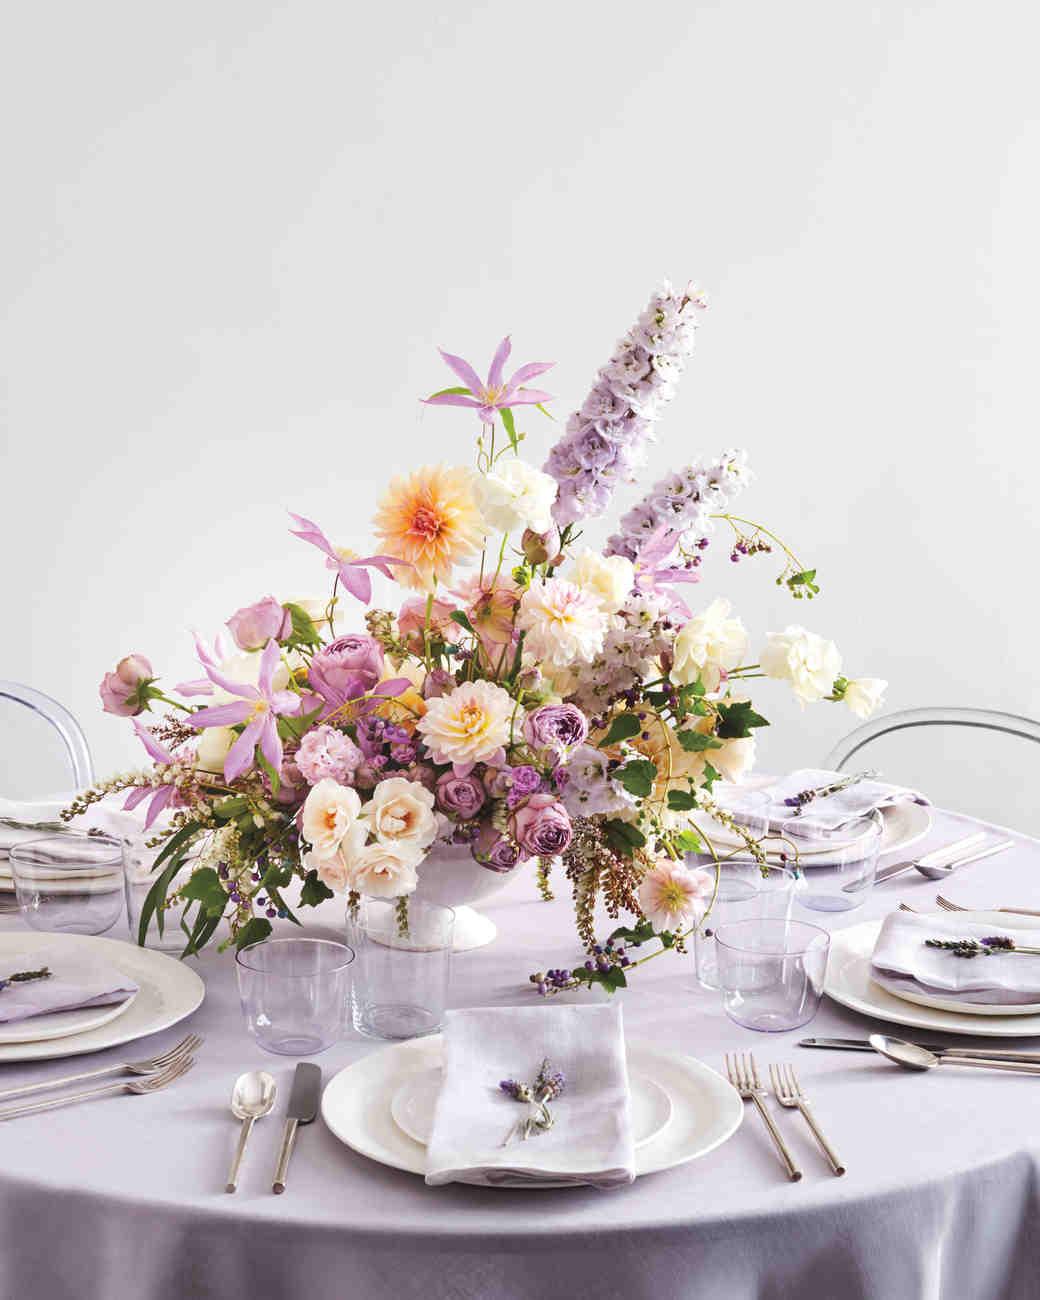 Best ideas about DIY Centerpieces For Wedding . Save or Pin 23 DIY Wedding Centerpieces We Love Now.